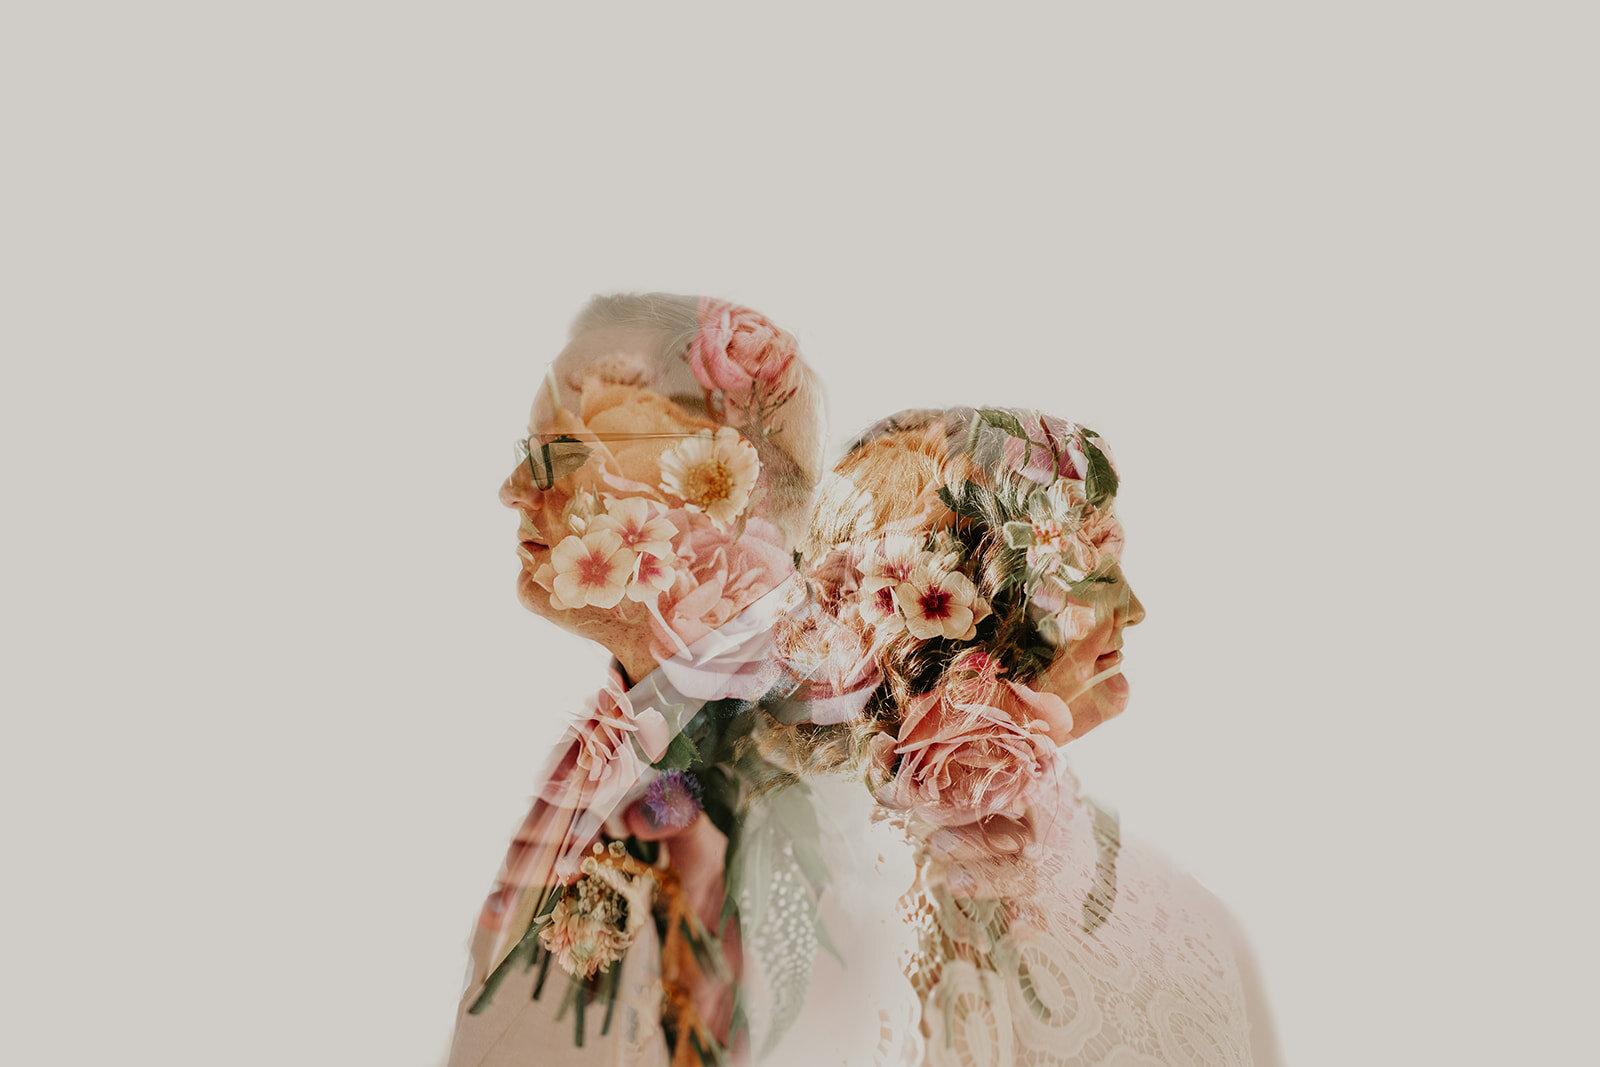 joel-ashley-wedding-ruins-astoria-jamiecarle-3-2.jpg